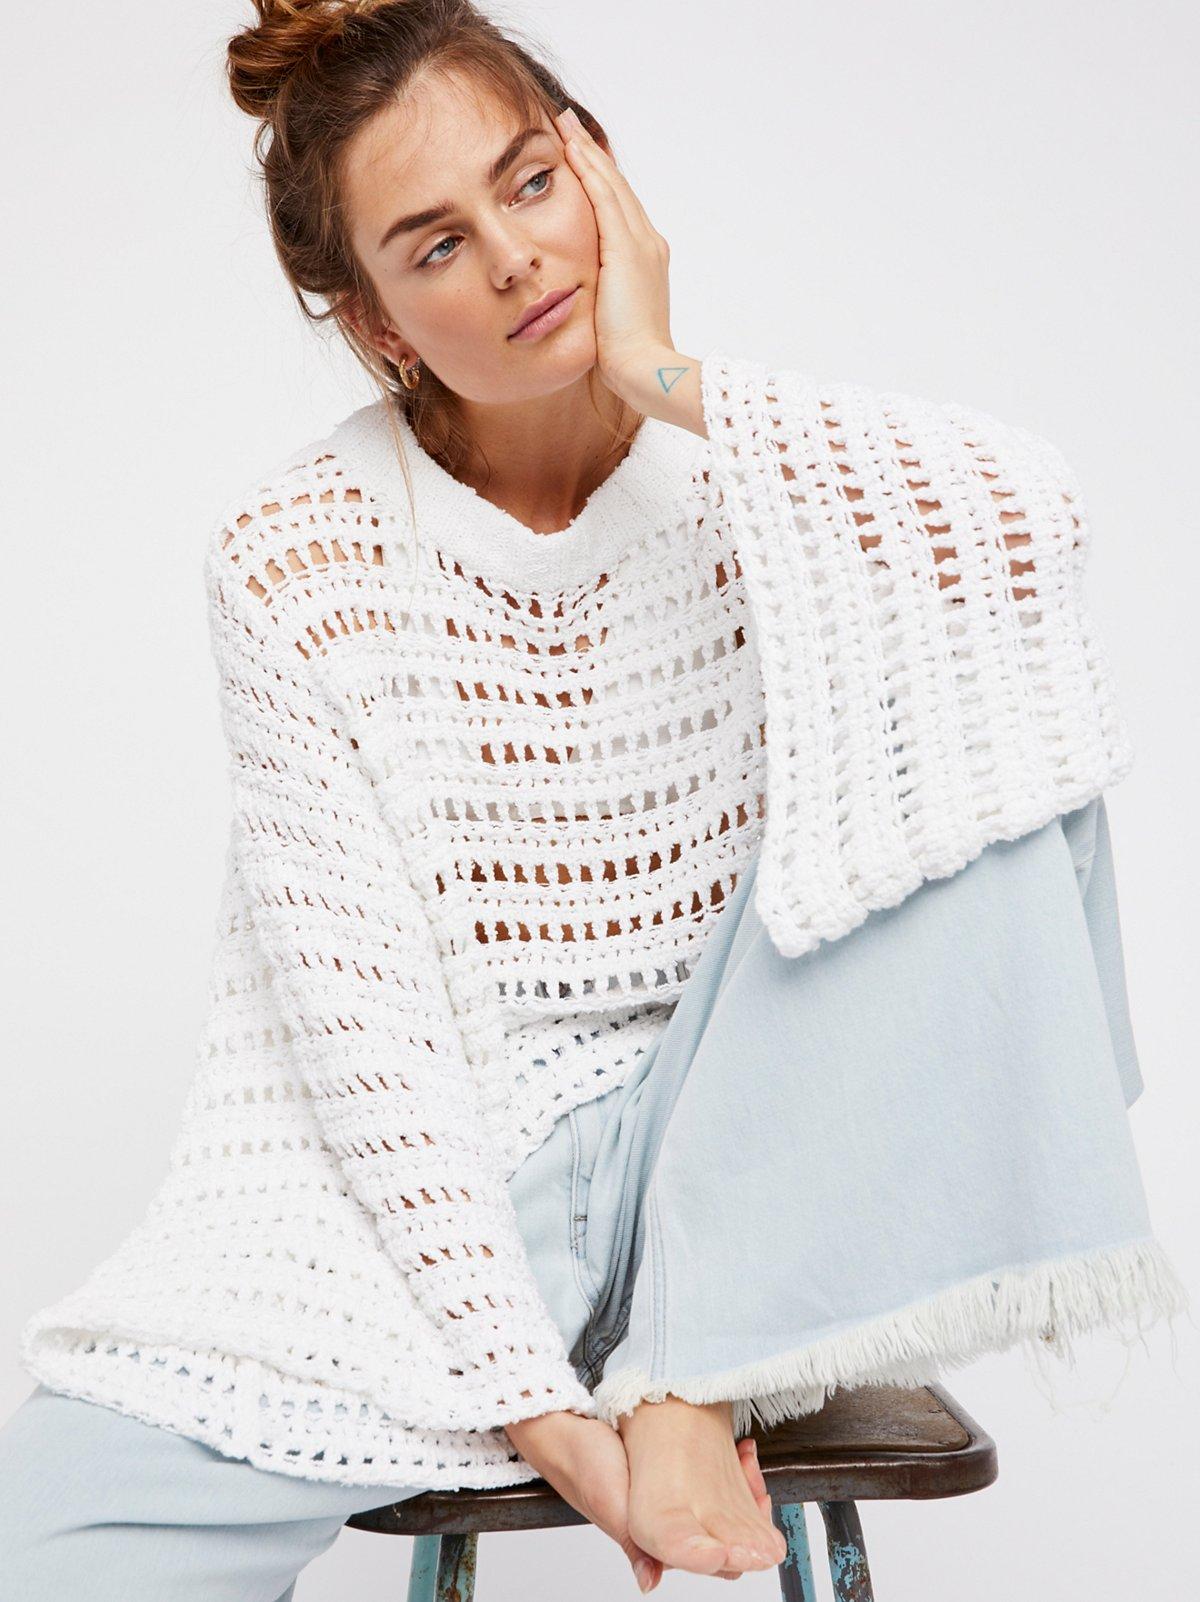 Caught Up Crochet Top